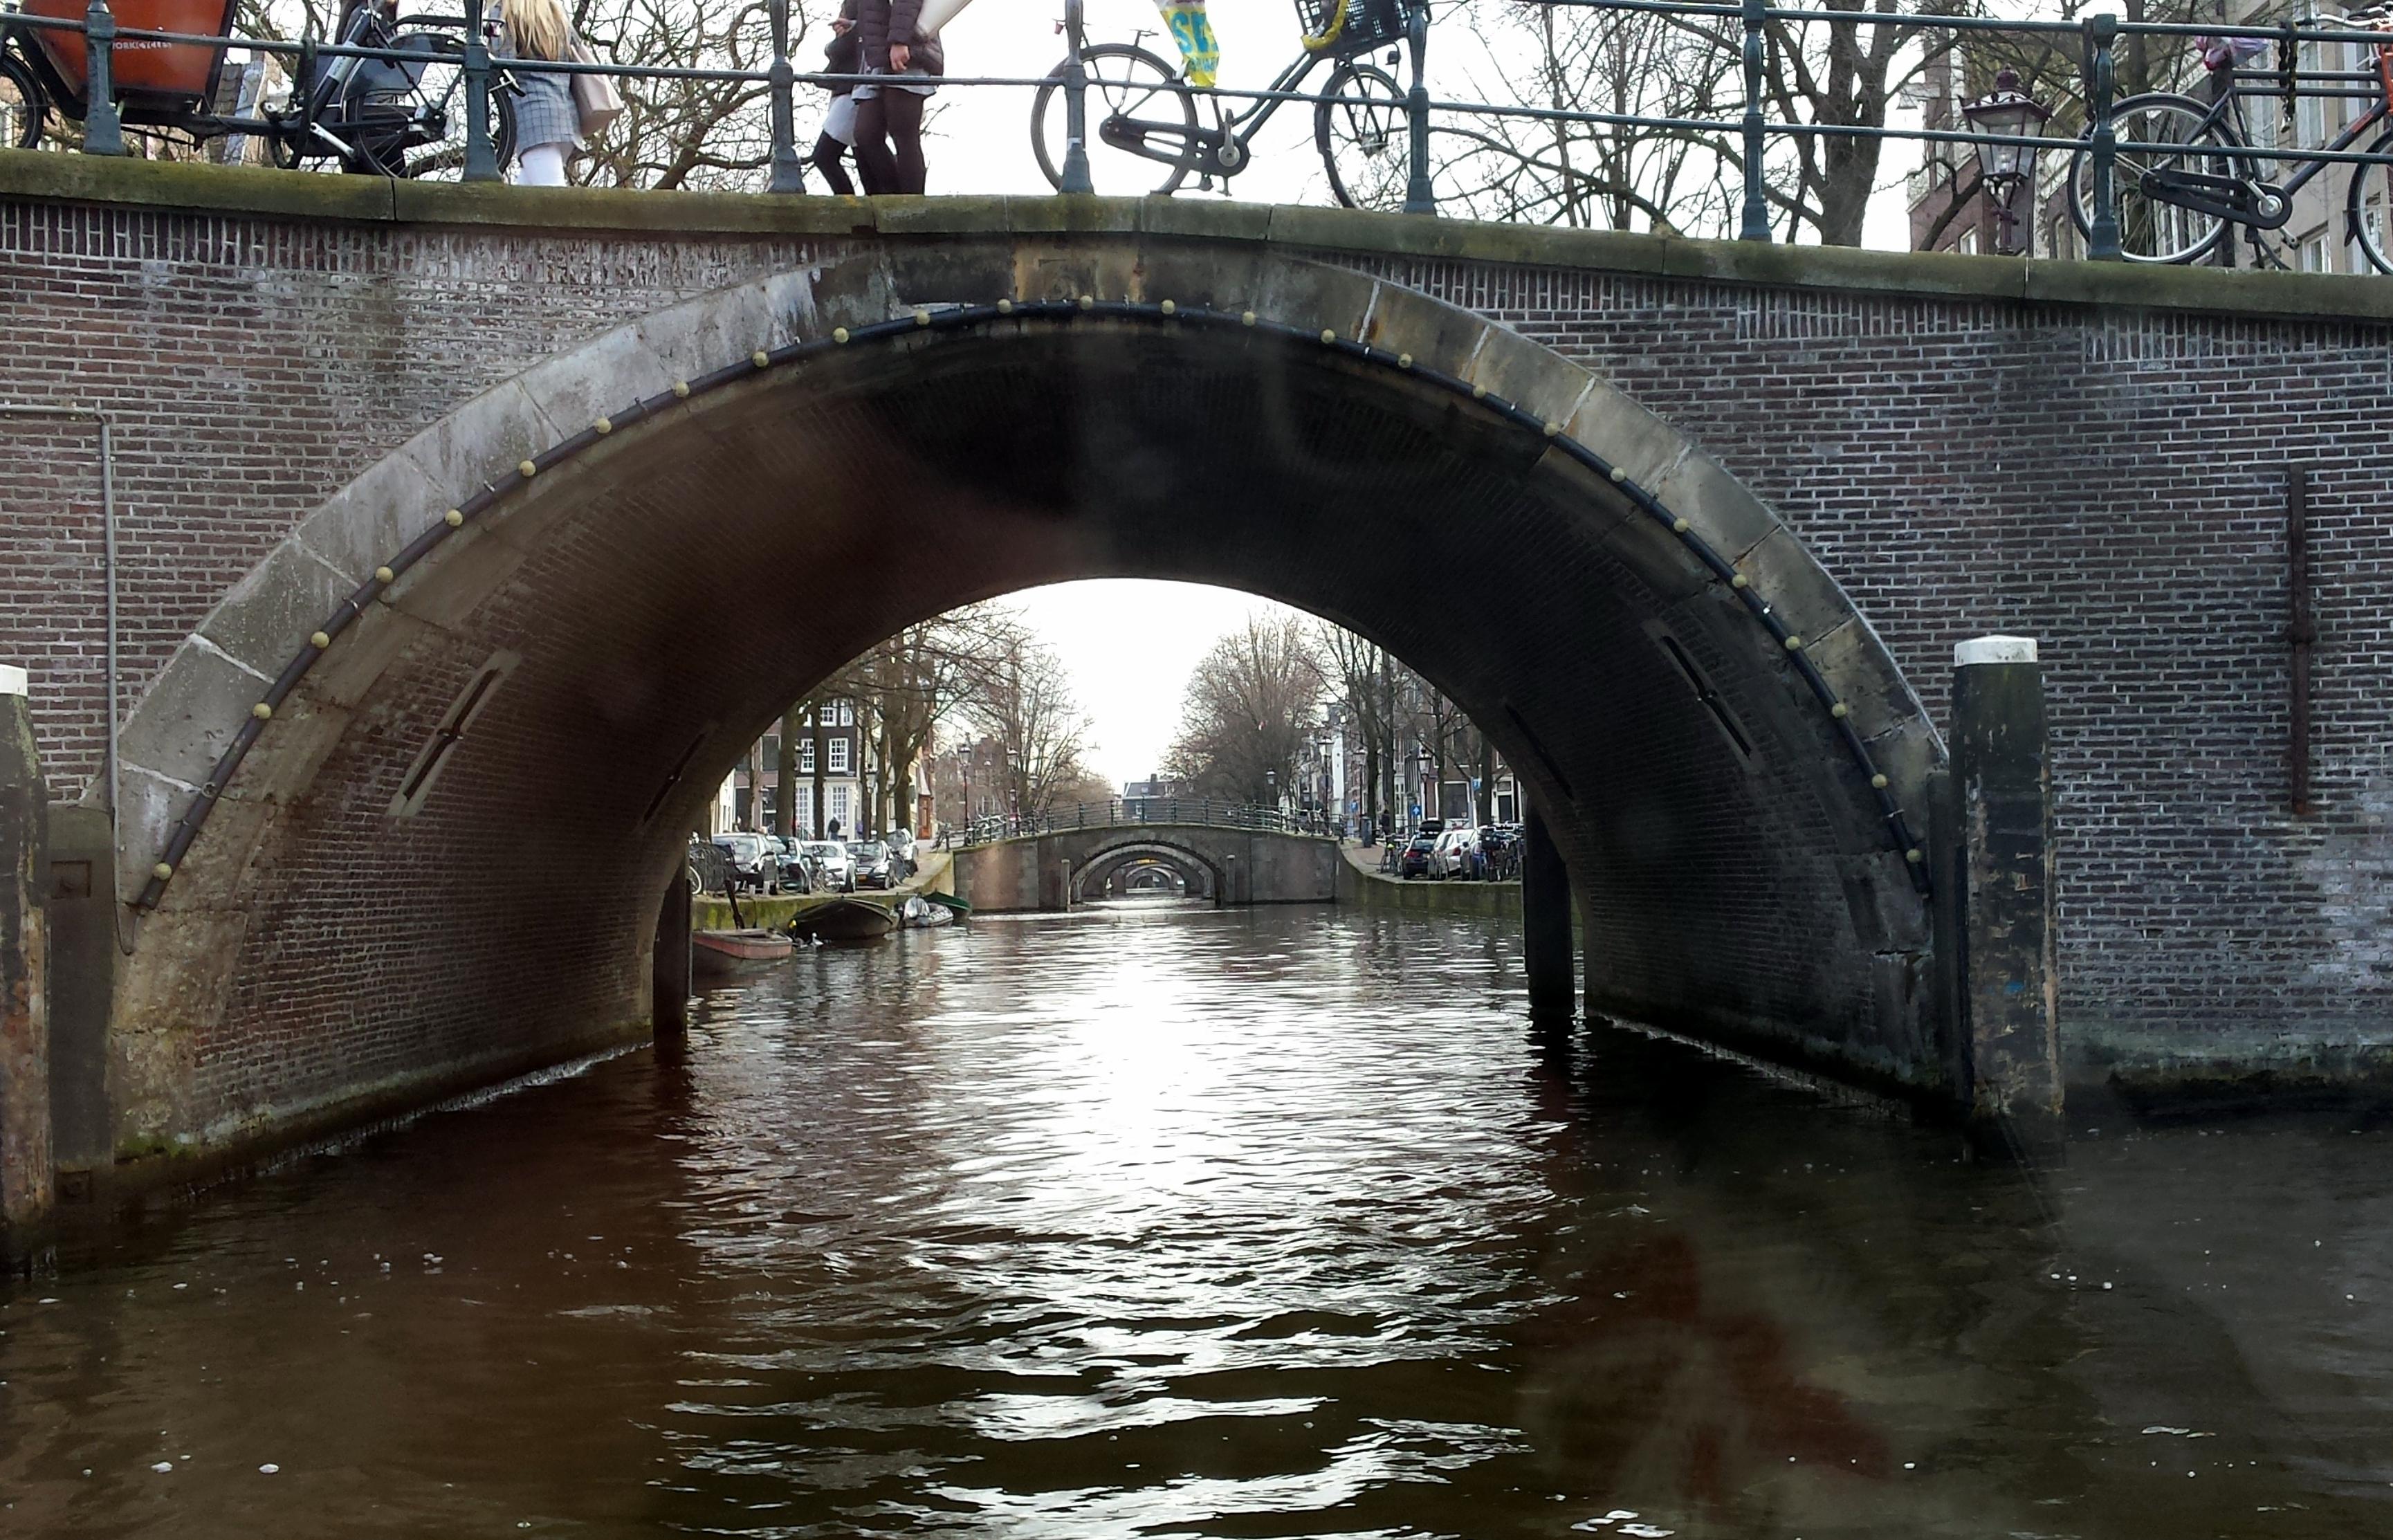 20150306_162612 Amsterdam (II parte) Viajes